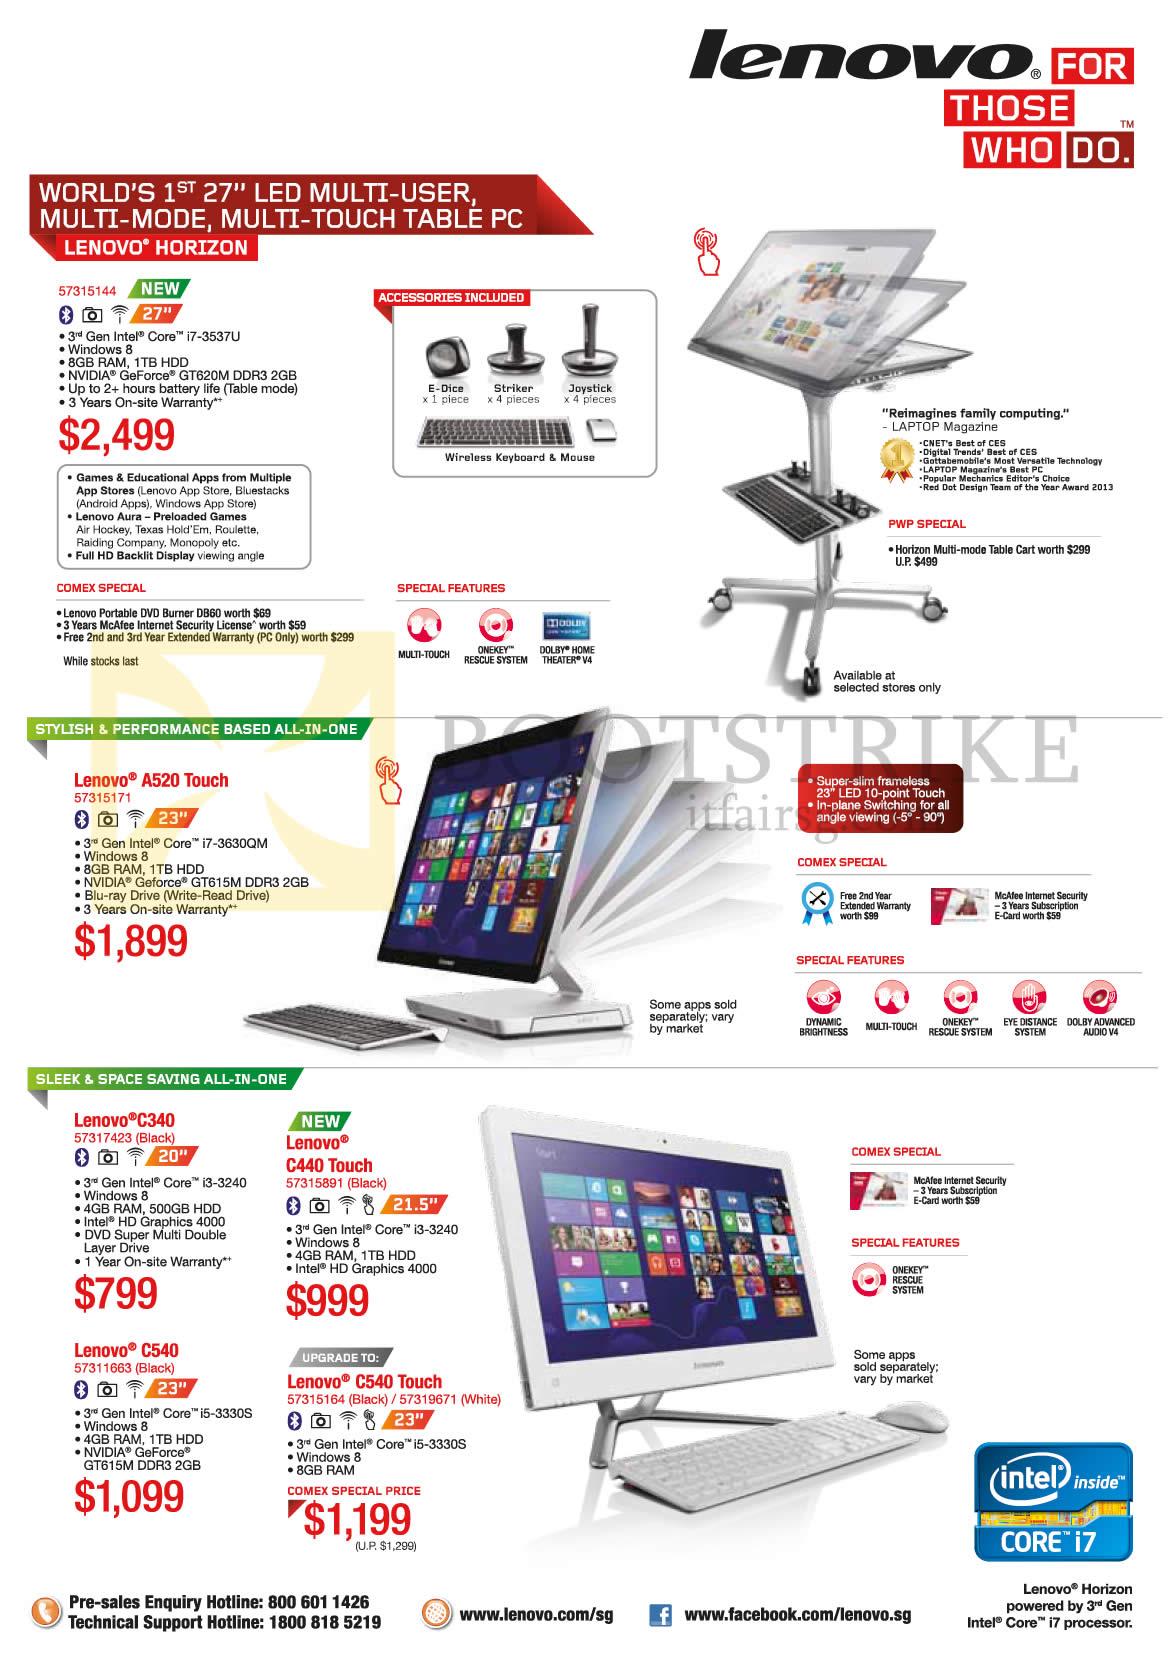 COMEX 2013 price list image brochure of Lenovo Desktop PC AIO Horizon, A520 Touch, C340, C440 Touch, C540